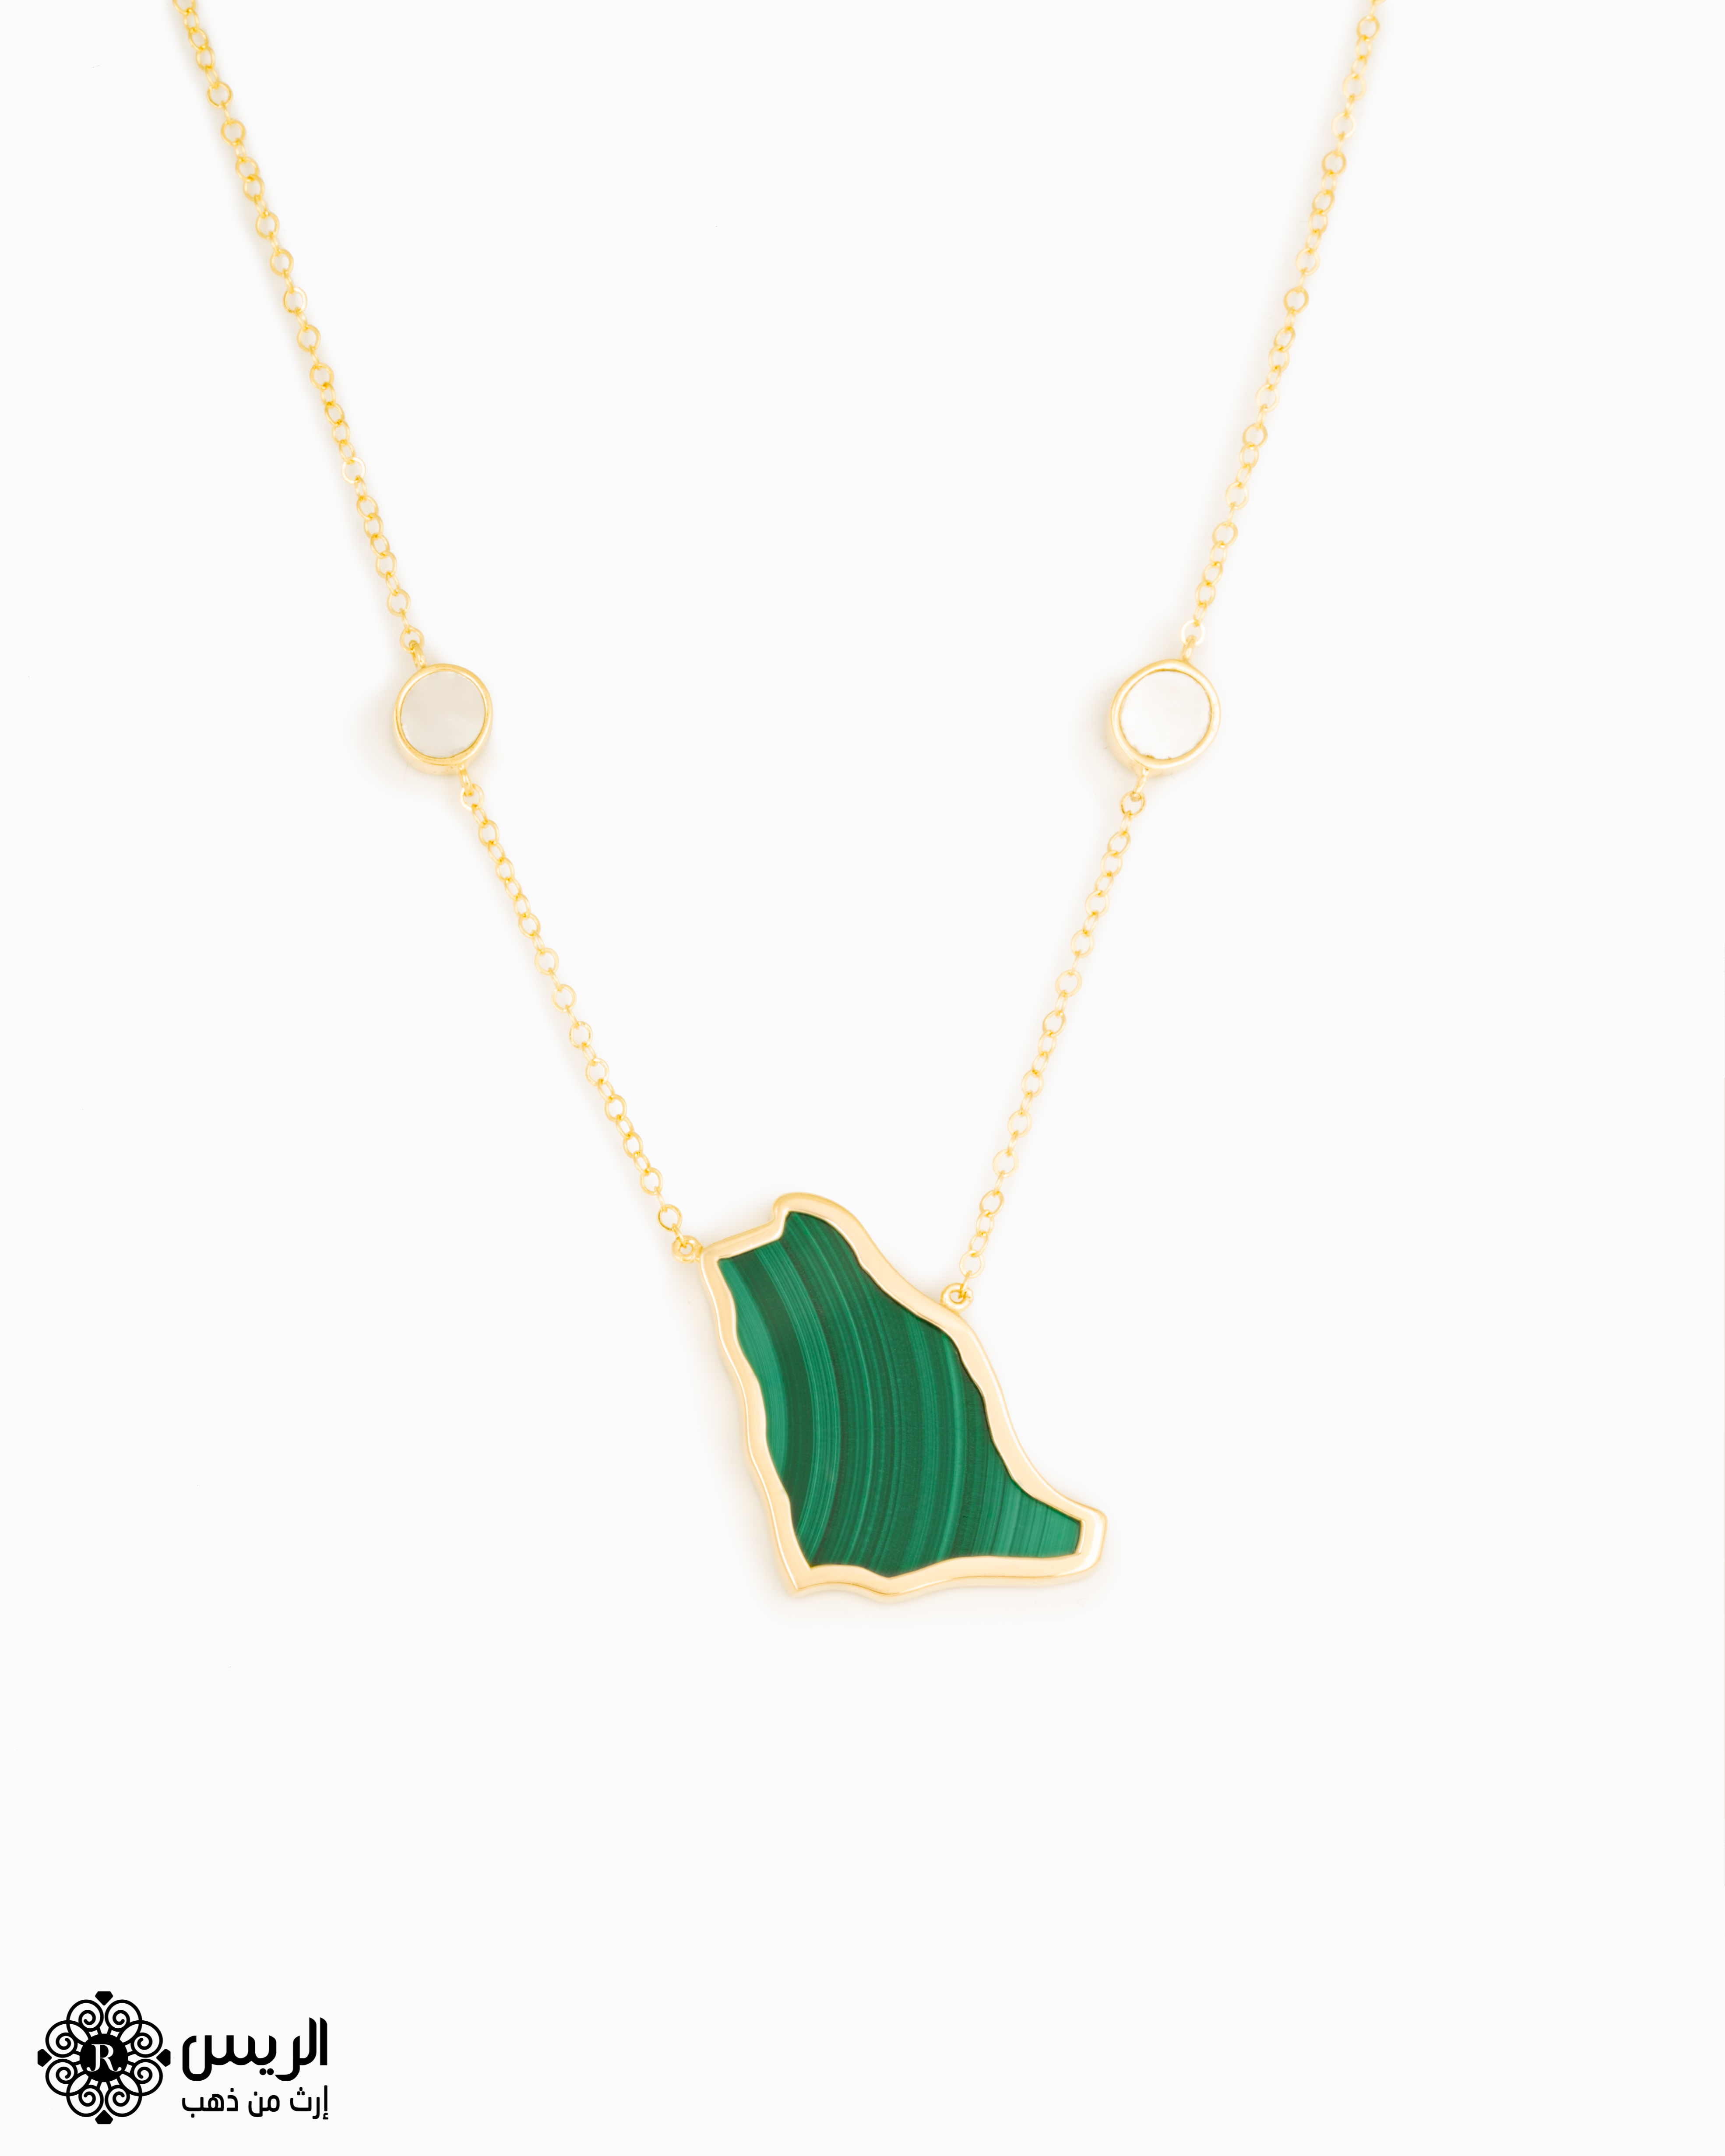 Raies jewelry Necklace With Chain KSA Map Malachite Stone تعليقة مع سلسله خريطة المملكة بحجر ملاكيت الريس للمجوهرات